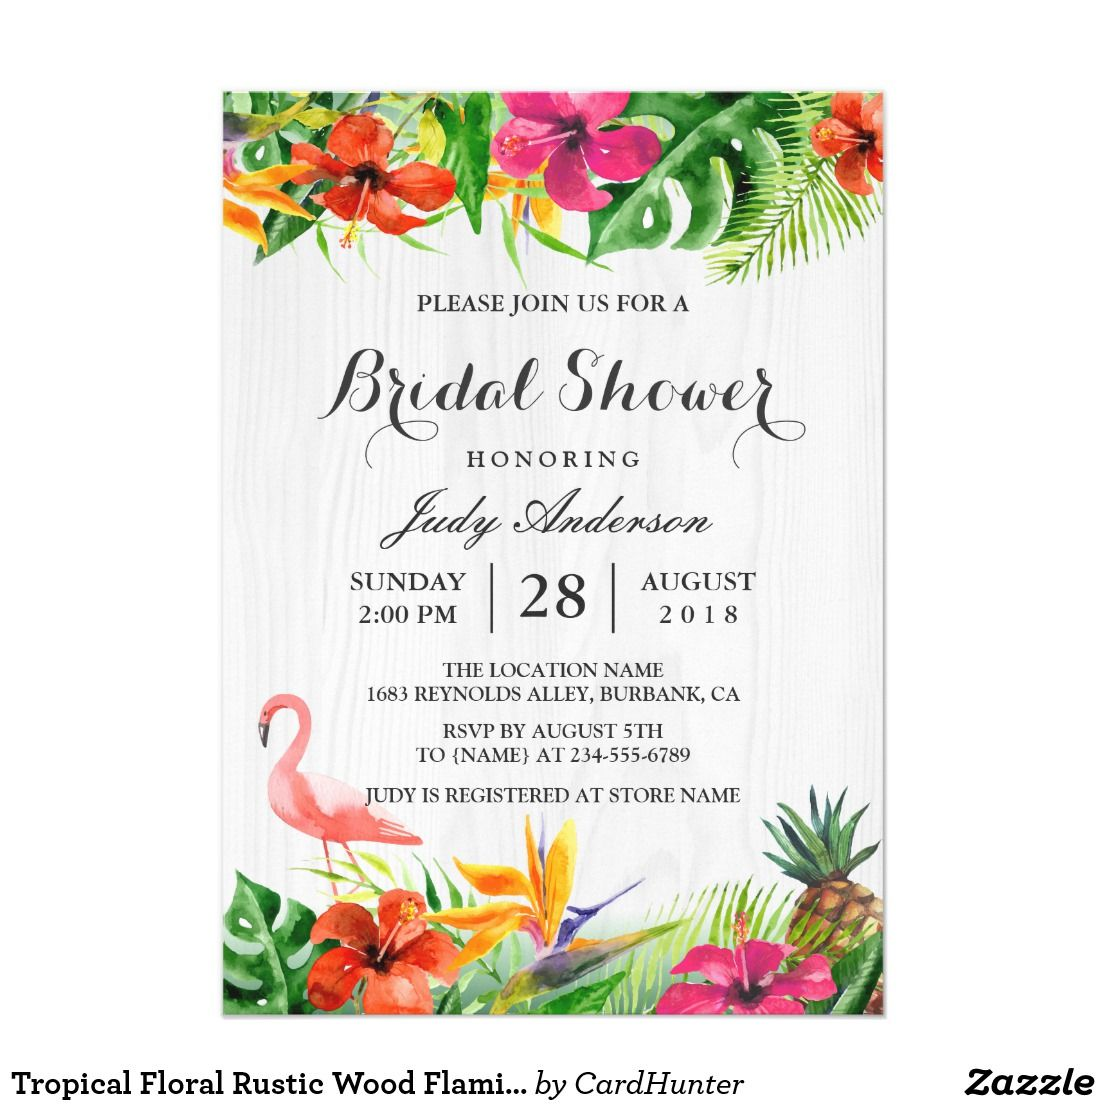 Tropical Floral Rustic Wood Flamingo Bridal Shower Card | Bridal ...